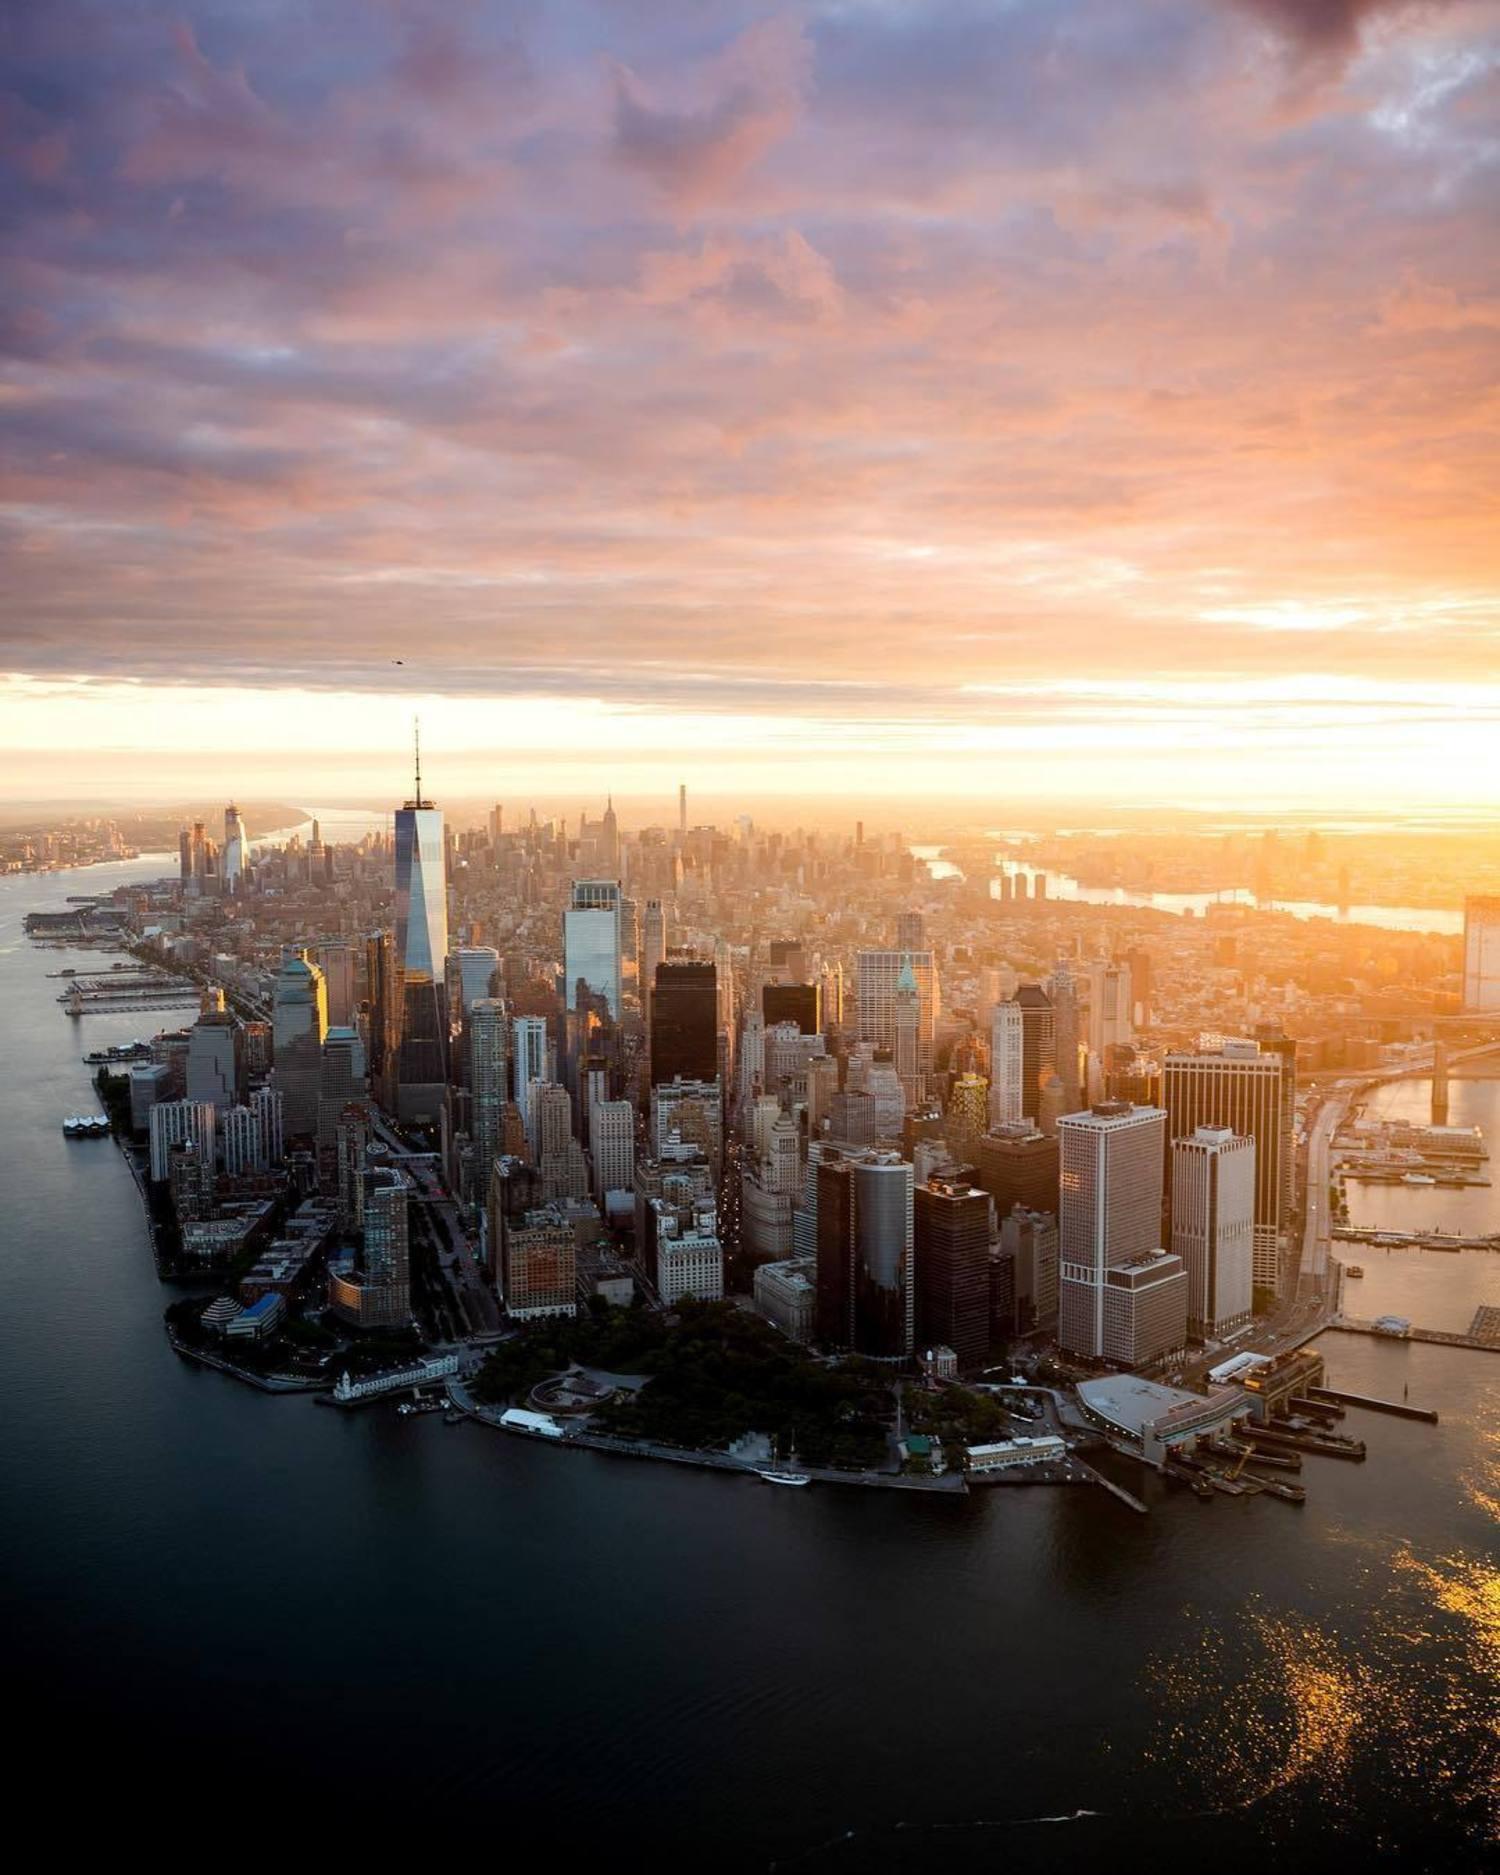 Stunning sunrise over New York, New York